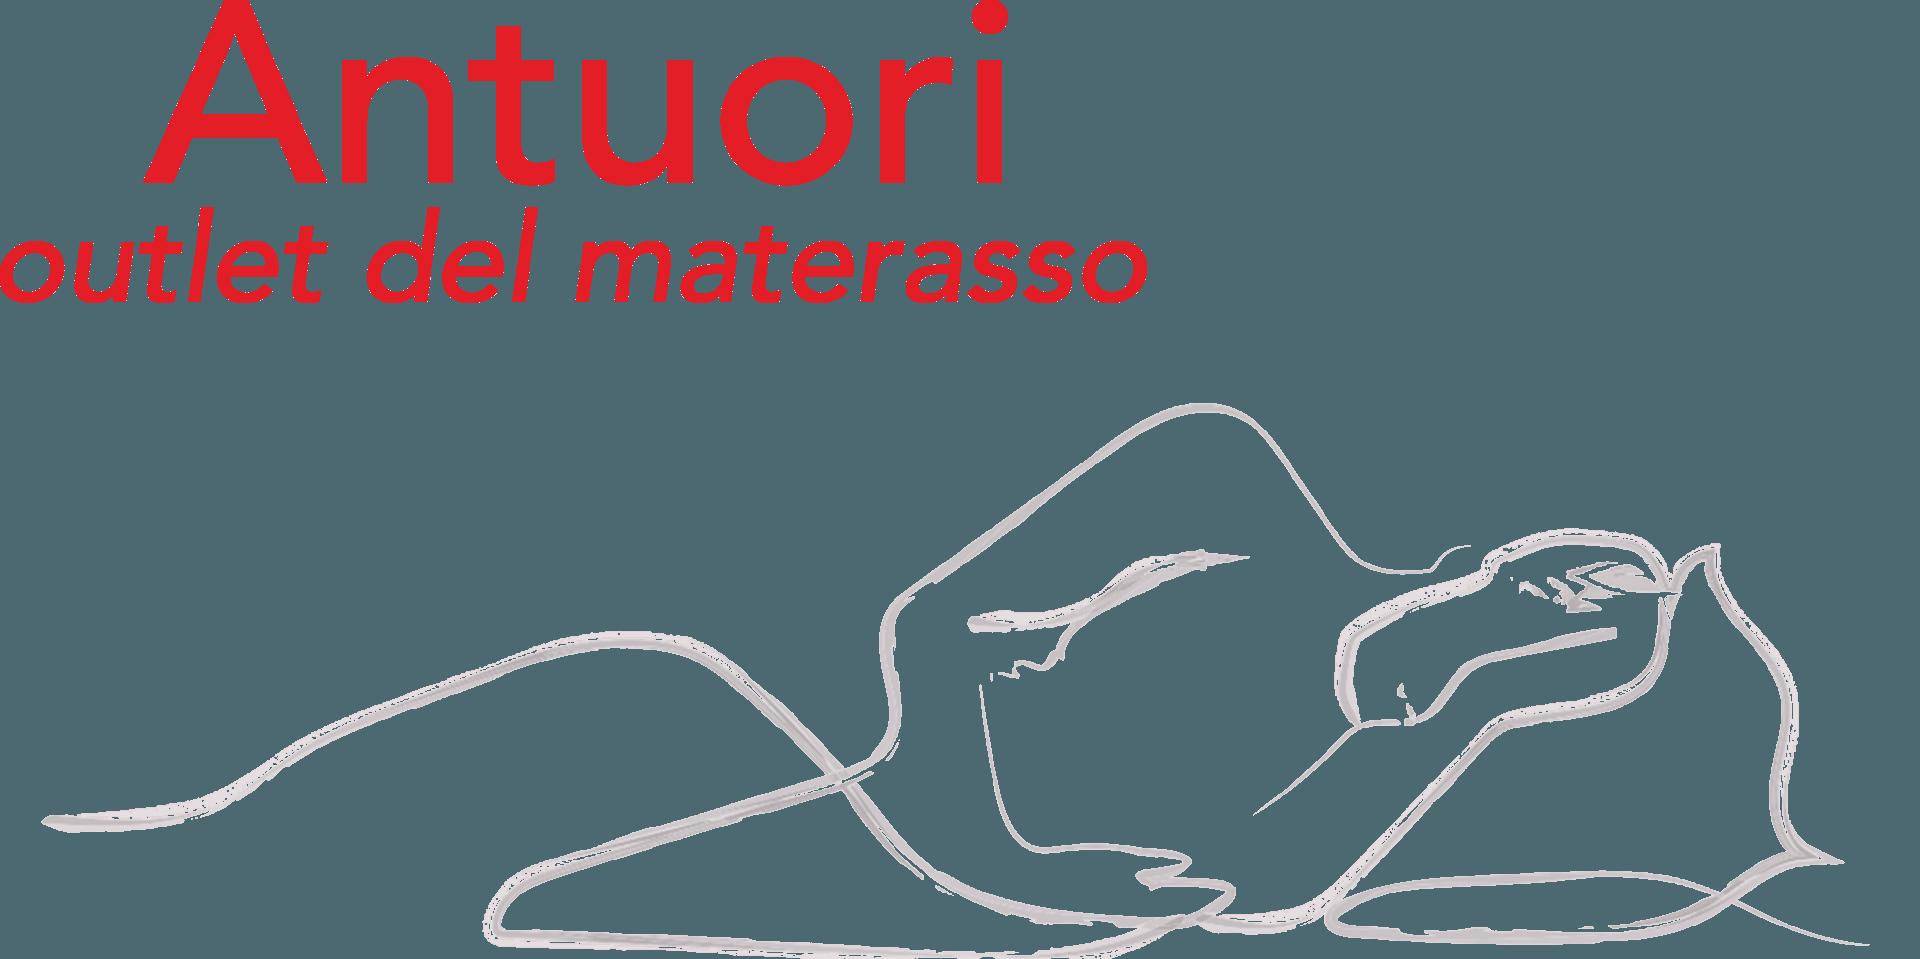 Materassi Antuori Roma.Outlet Di Materassi Roma Antuori